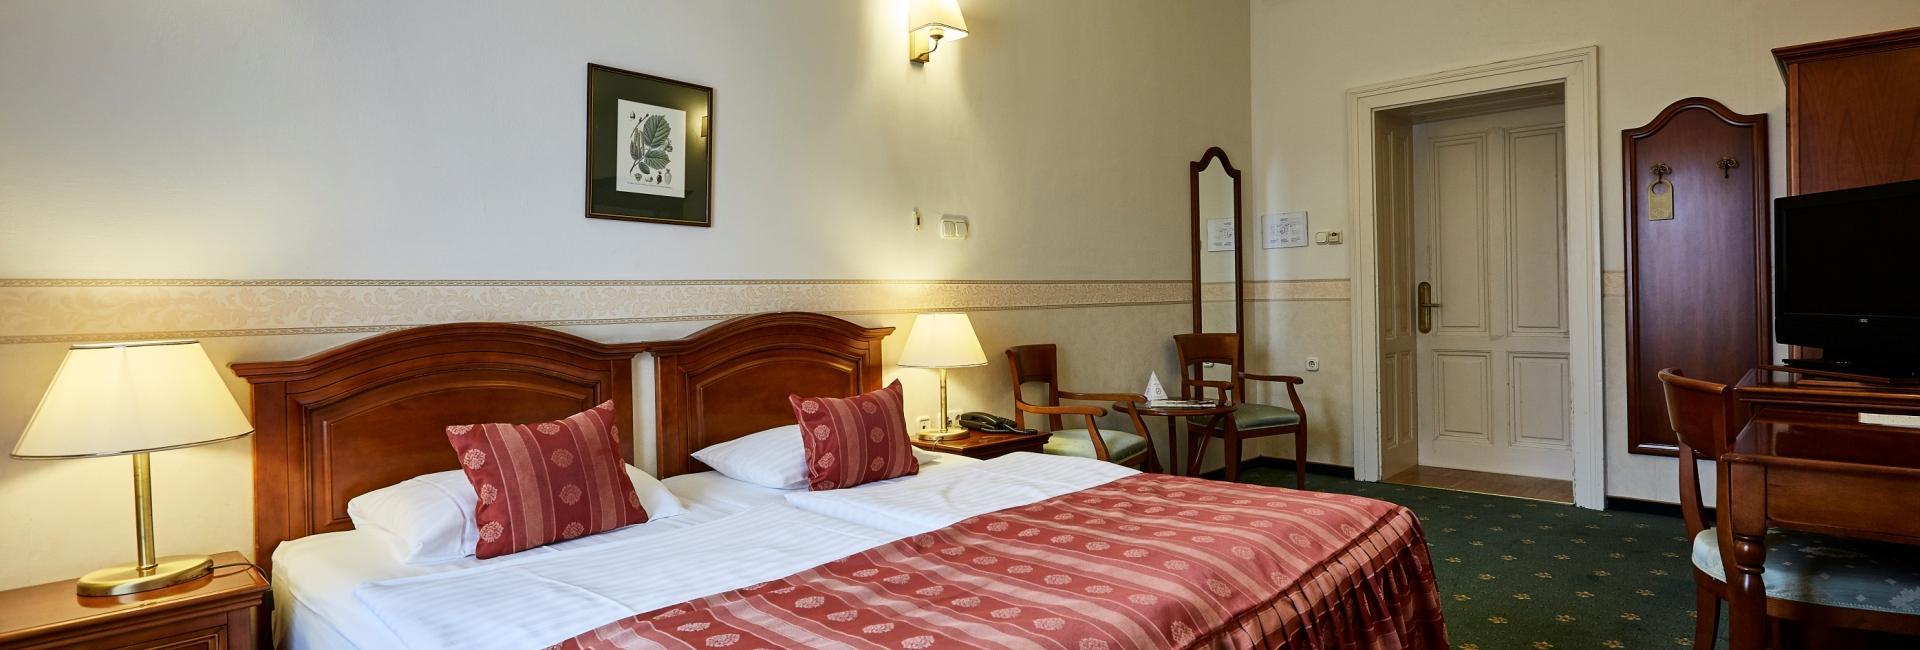 Room at Caste Hotel Szidonia